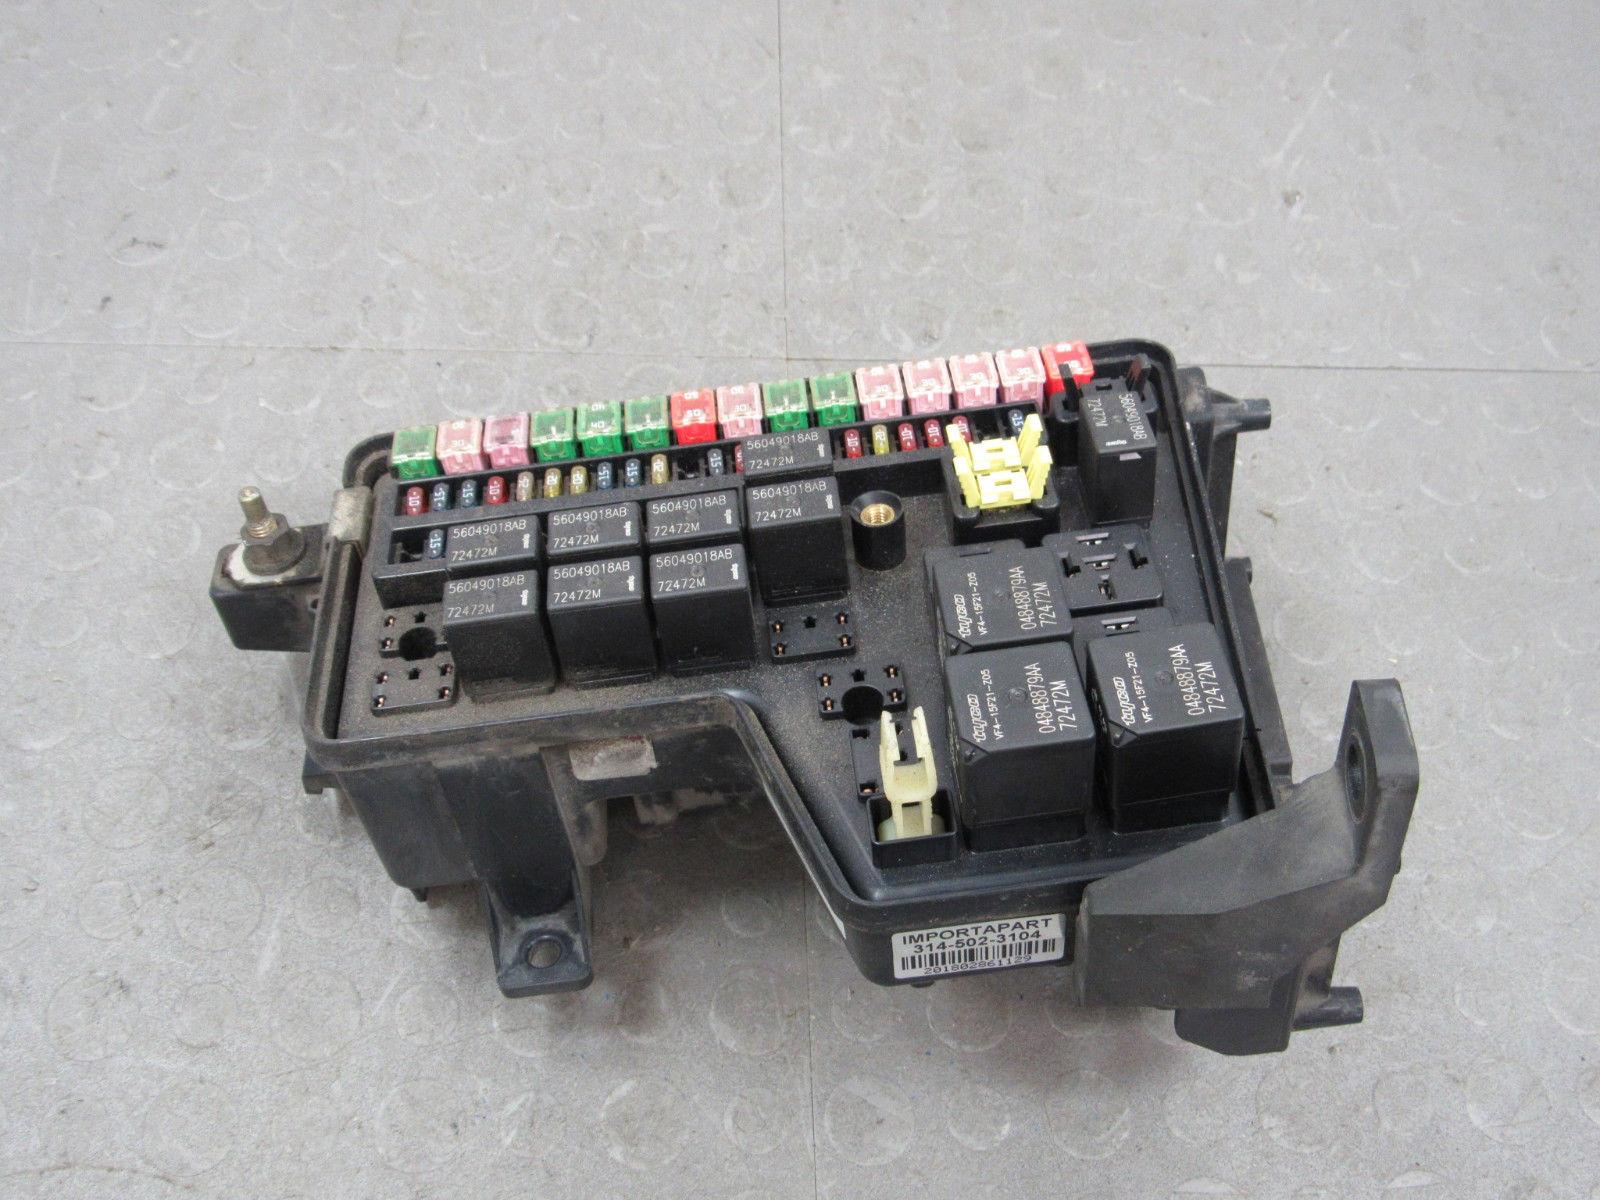 02-03 Dodge Ram Truck Integrated Power Module Fuse Box Block 56049680AA EF